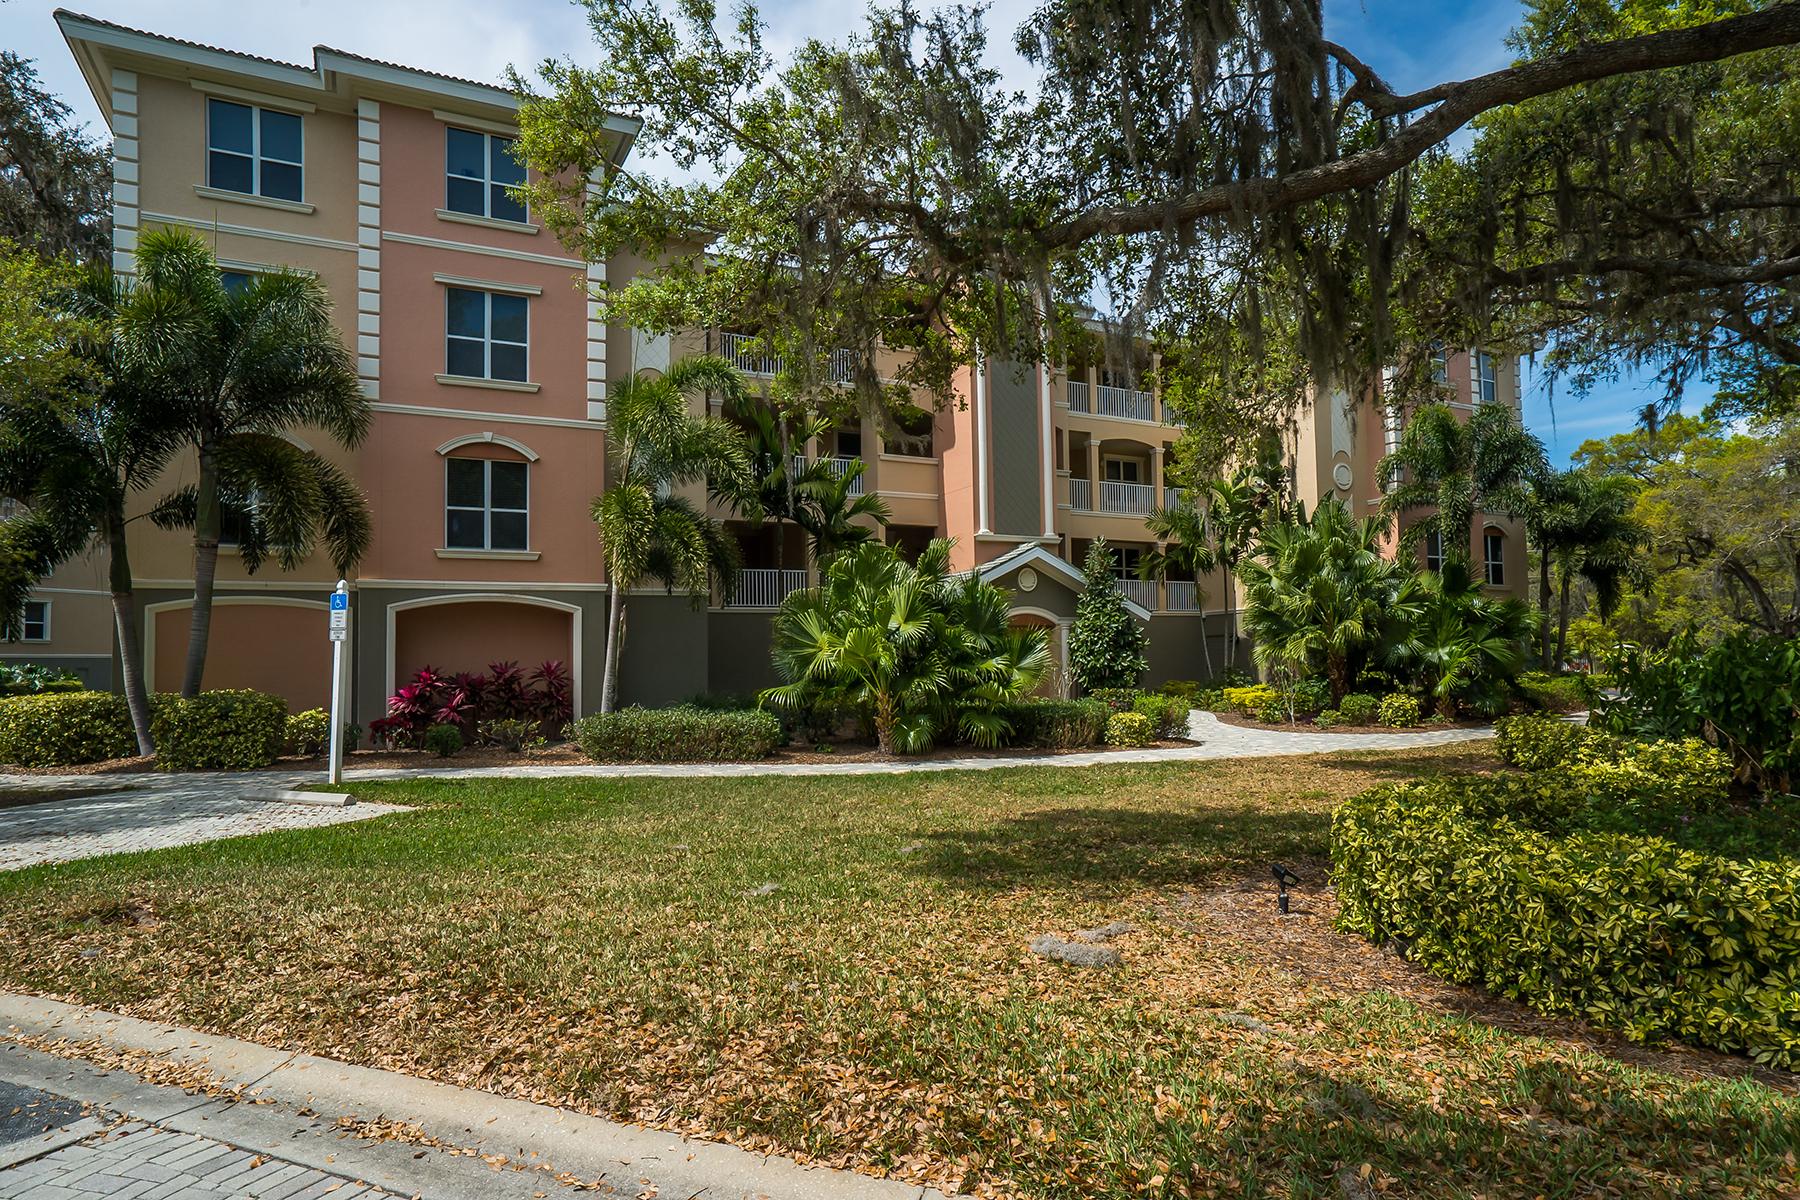 Condominium for Sale at GRAND OAKS PRESERVE 5110 Manorwood Dr 3D Sarasota, Florida, 34235 United States